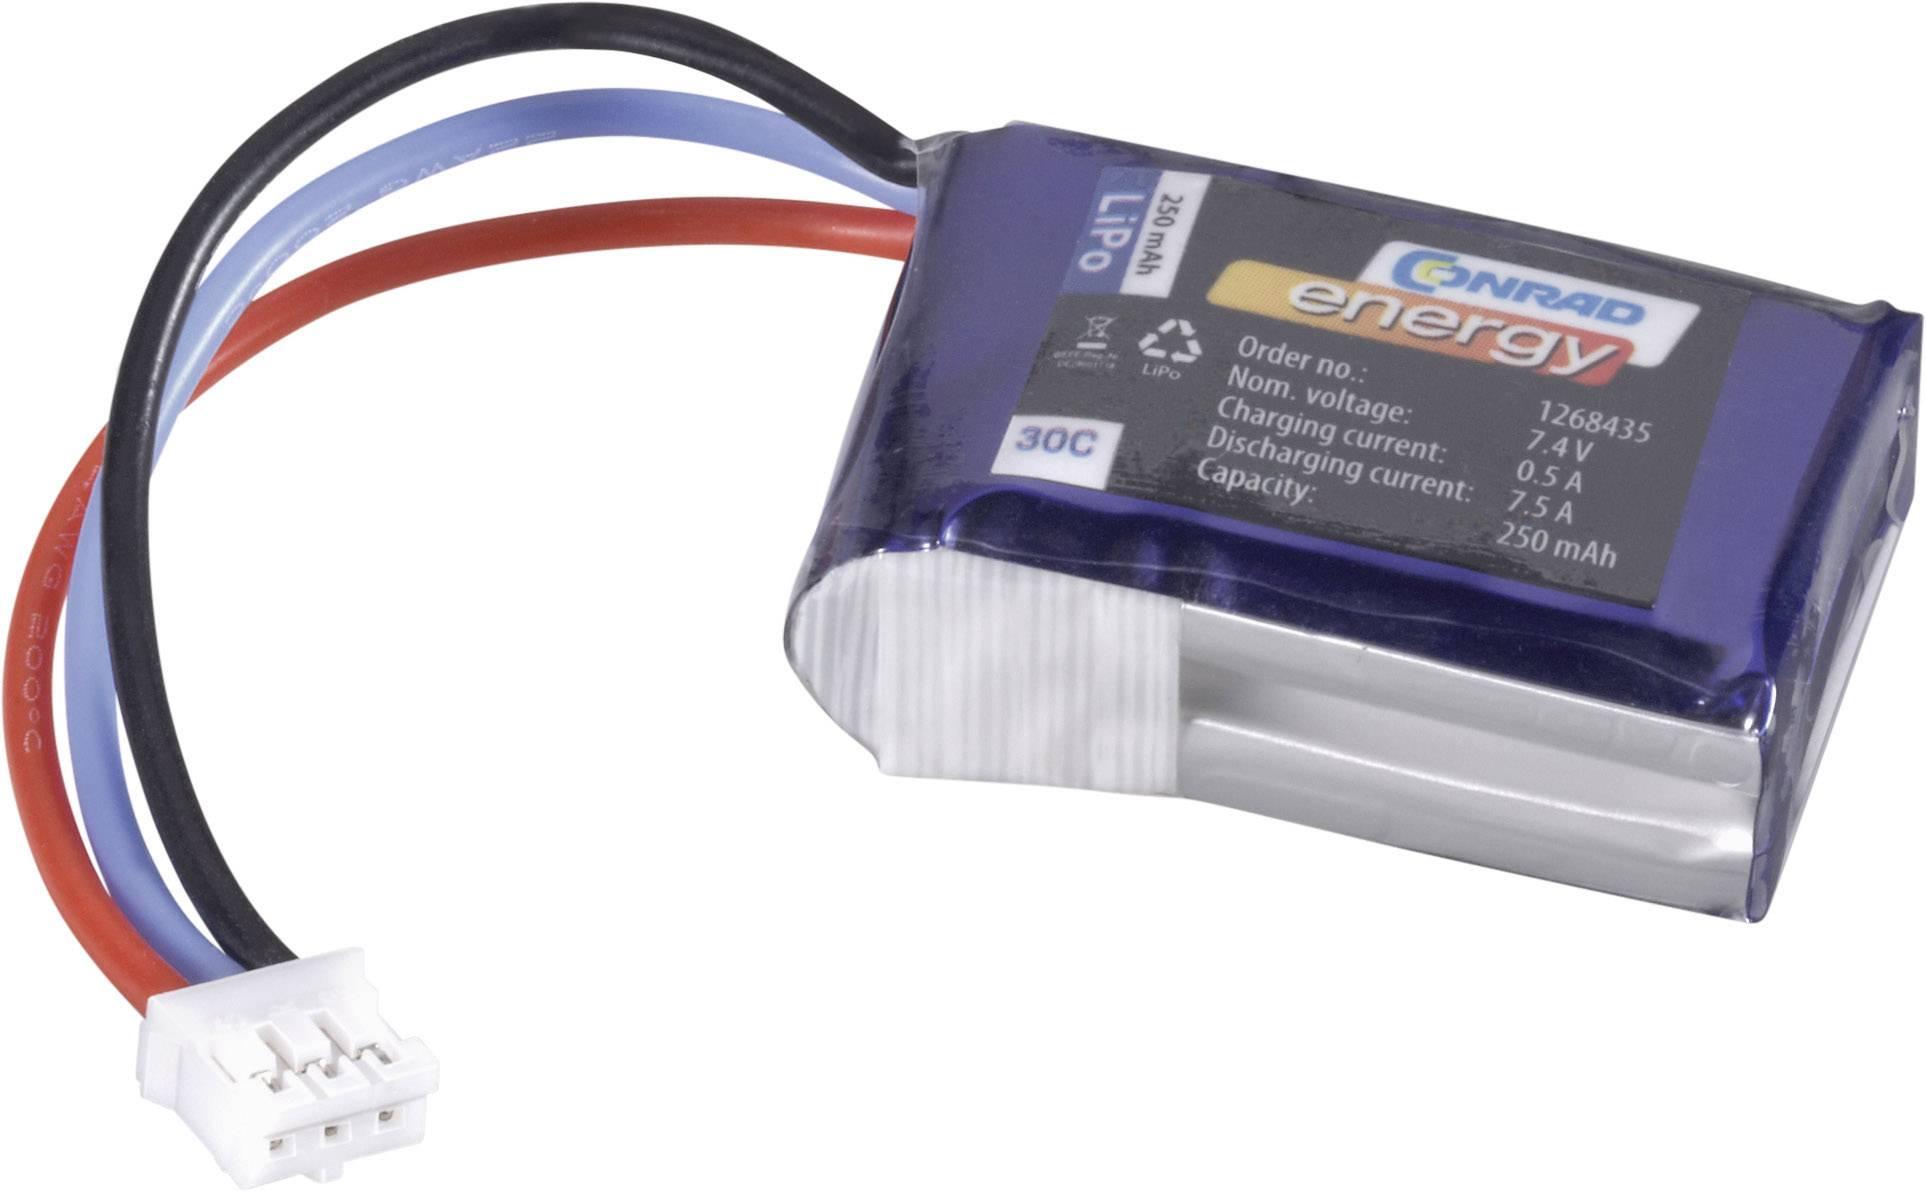 Akumulátor Akupack Li-Pol (modelárstvo) 7.4 V 250 mAh 30 C Conrad energy